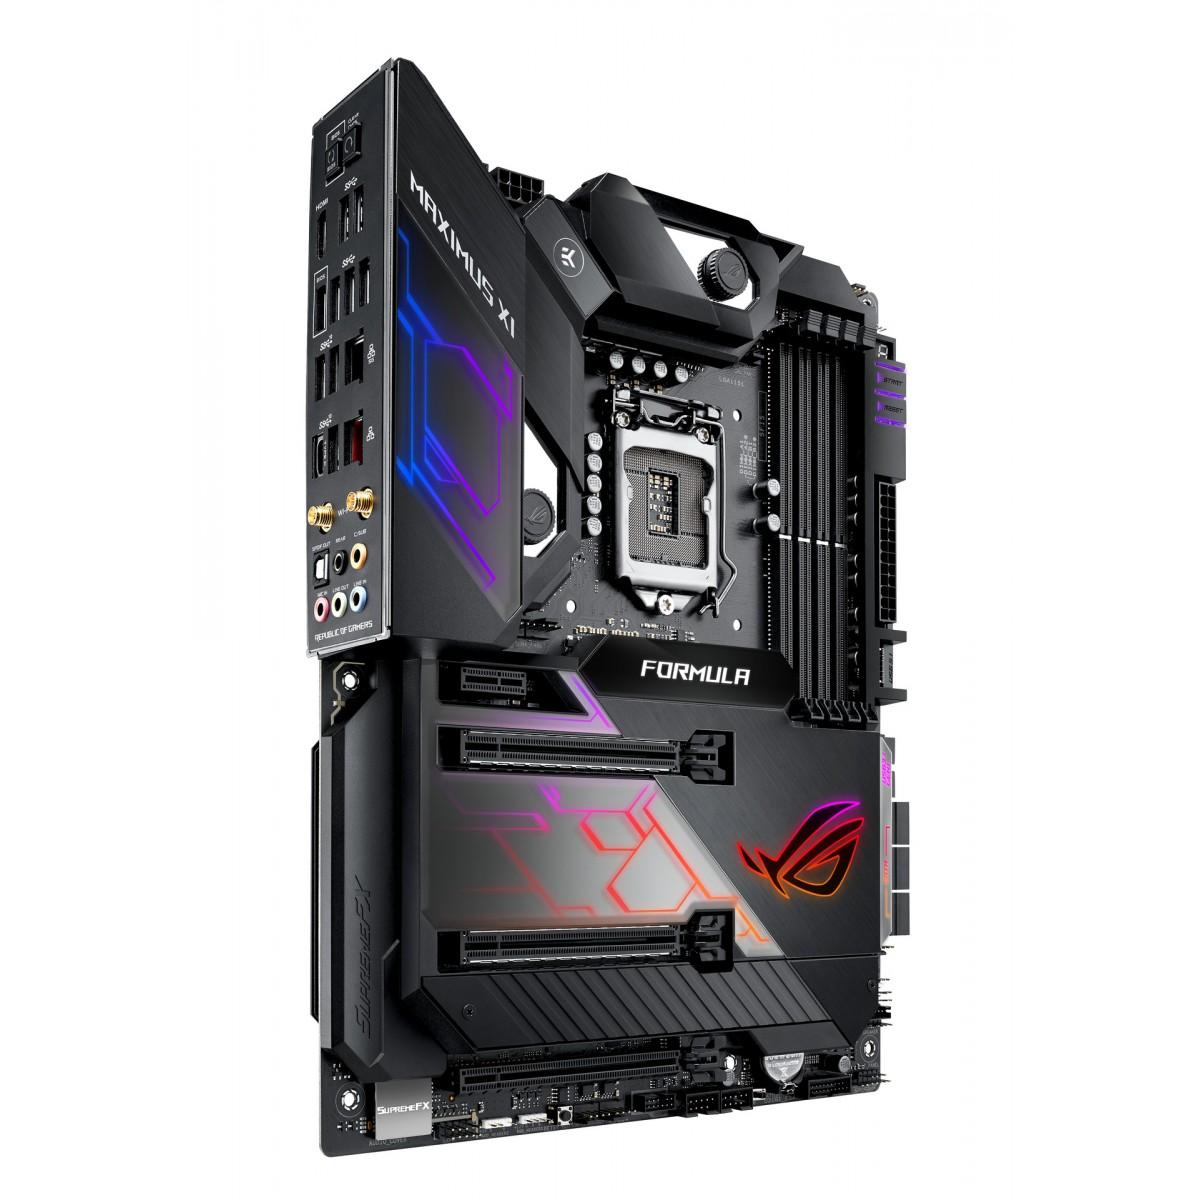 Placa Mãe Asus ROG Maximus XI Formula Chipset Z390, Intel LGA 1151, ATX, DDR4